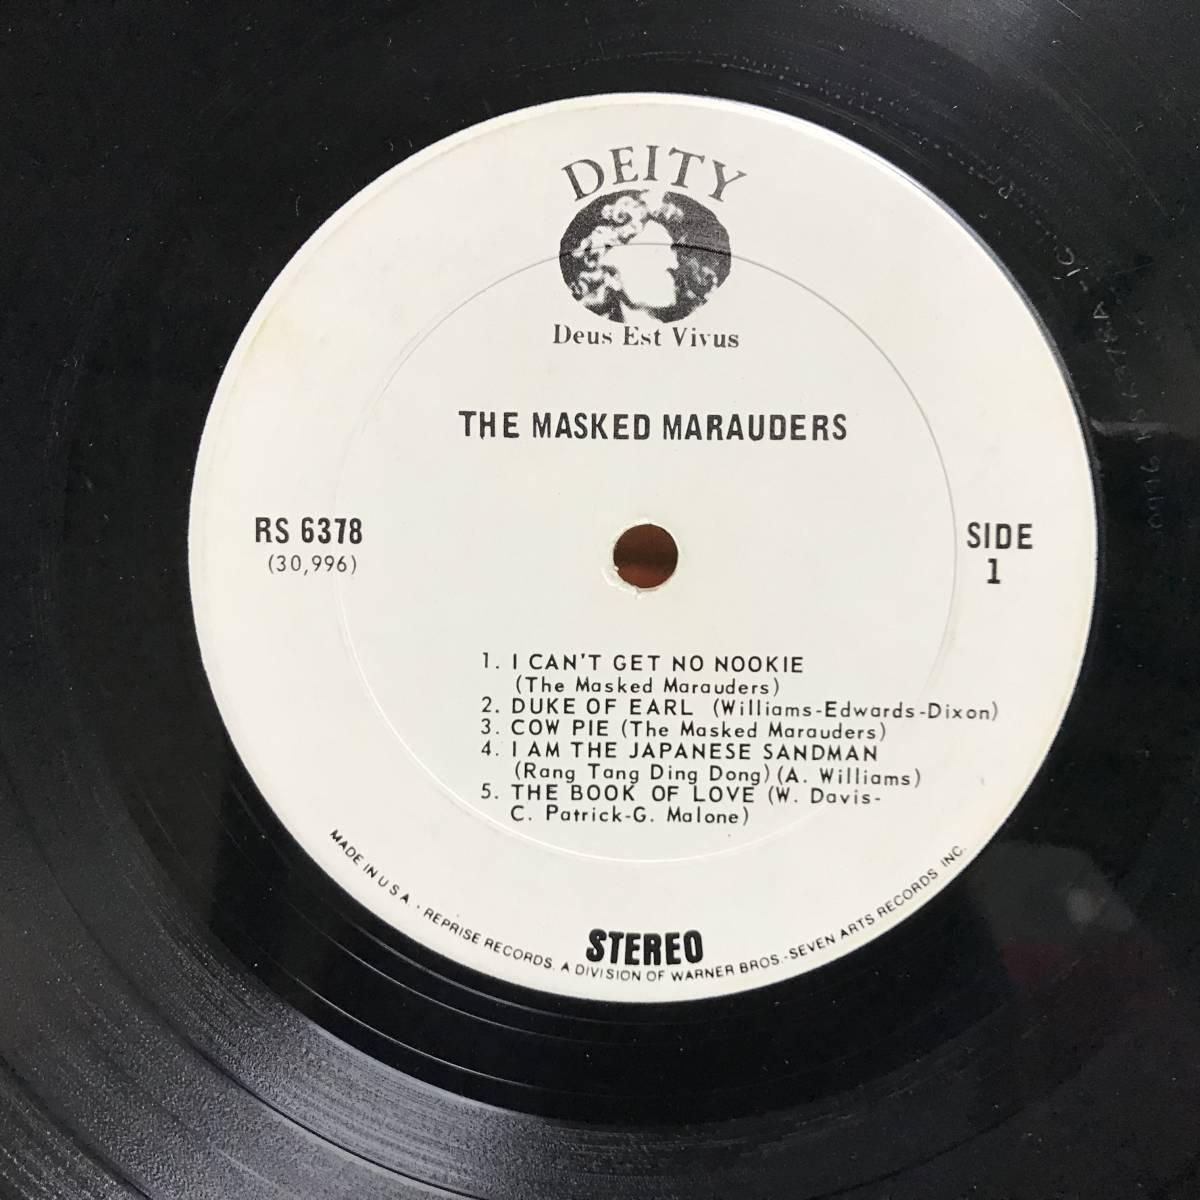 The Masked Marauders - The Masked Marauders/ US ORIGINAL/マト1